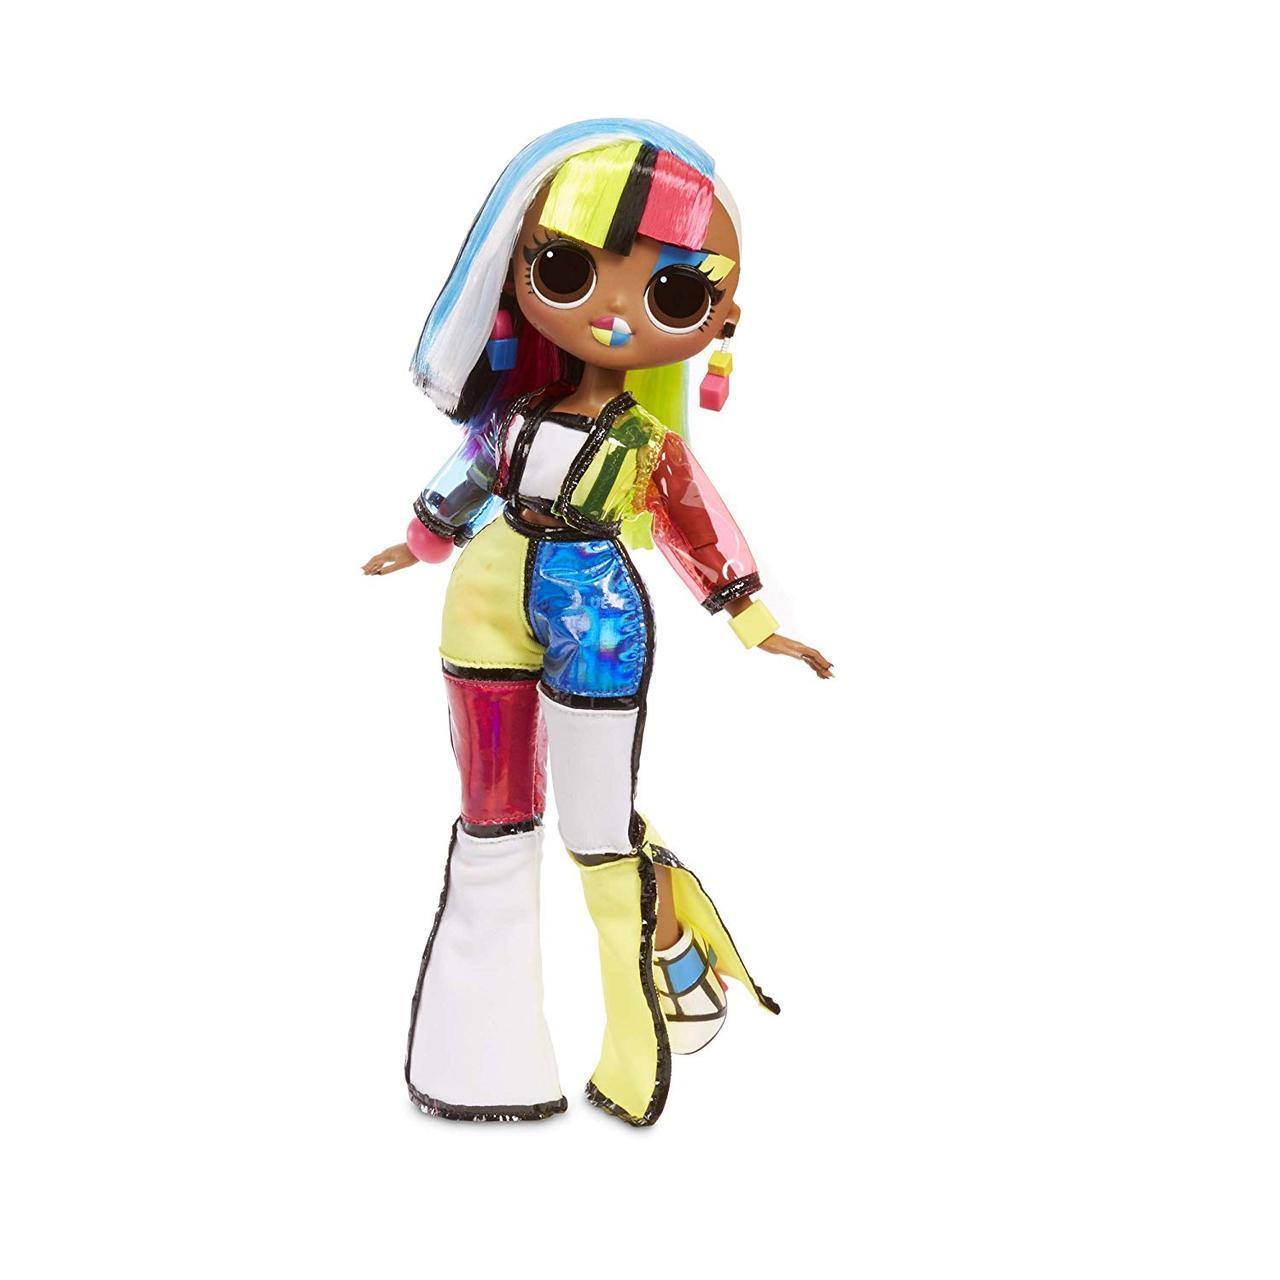 Кукла ЛОЛ Ангел Angles ОМГ светящаяся LOL сюрприз L.O.L. Surprise! O.M.G. Lights Fashion 15 Surprises